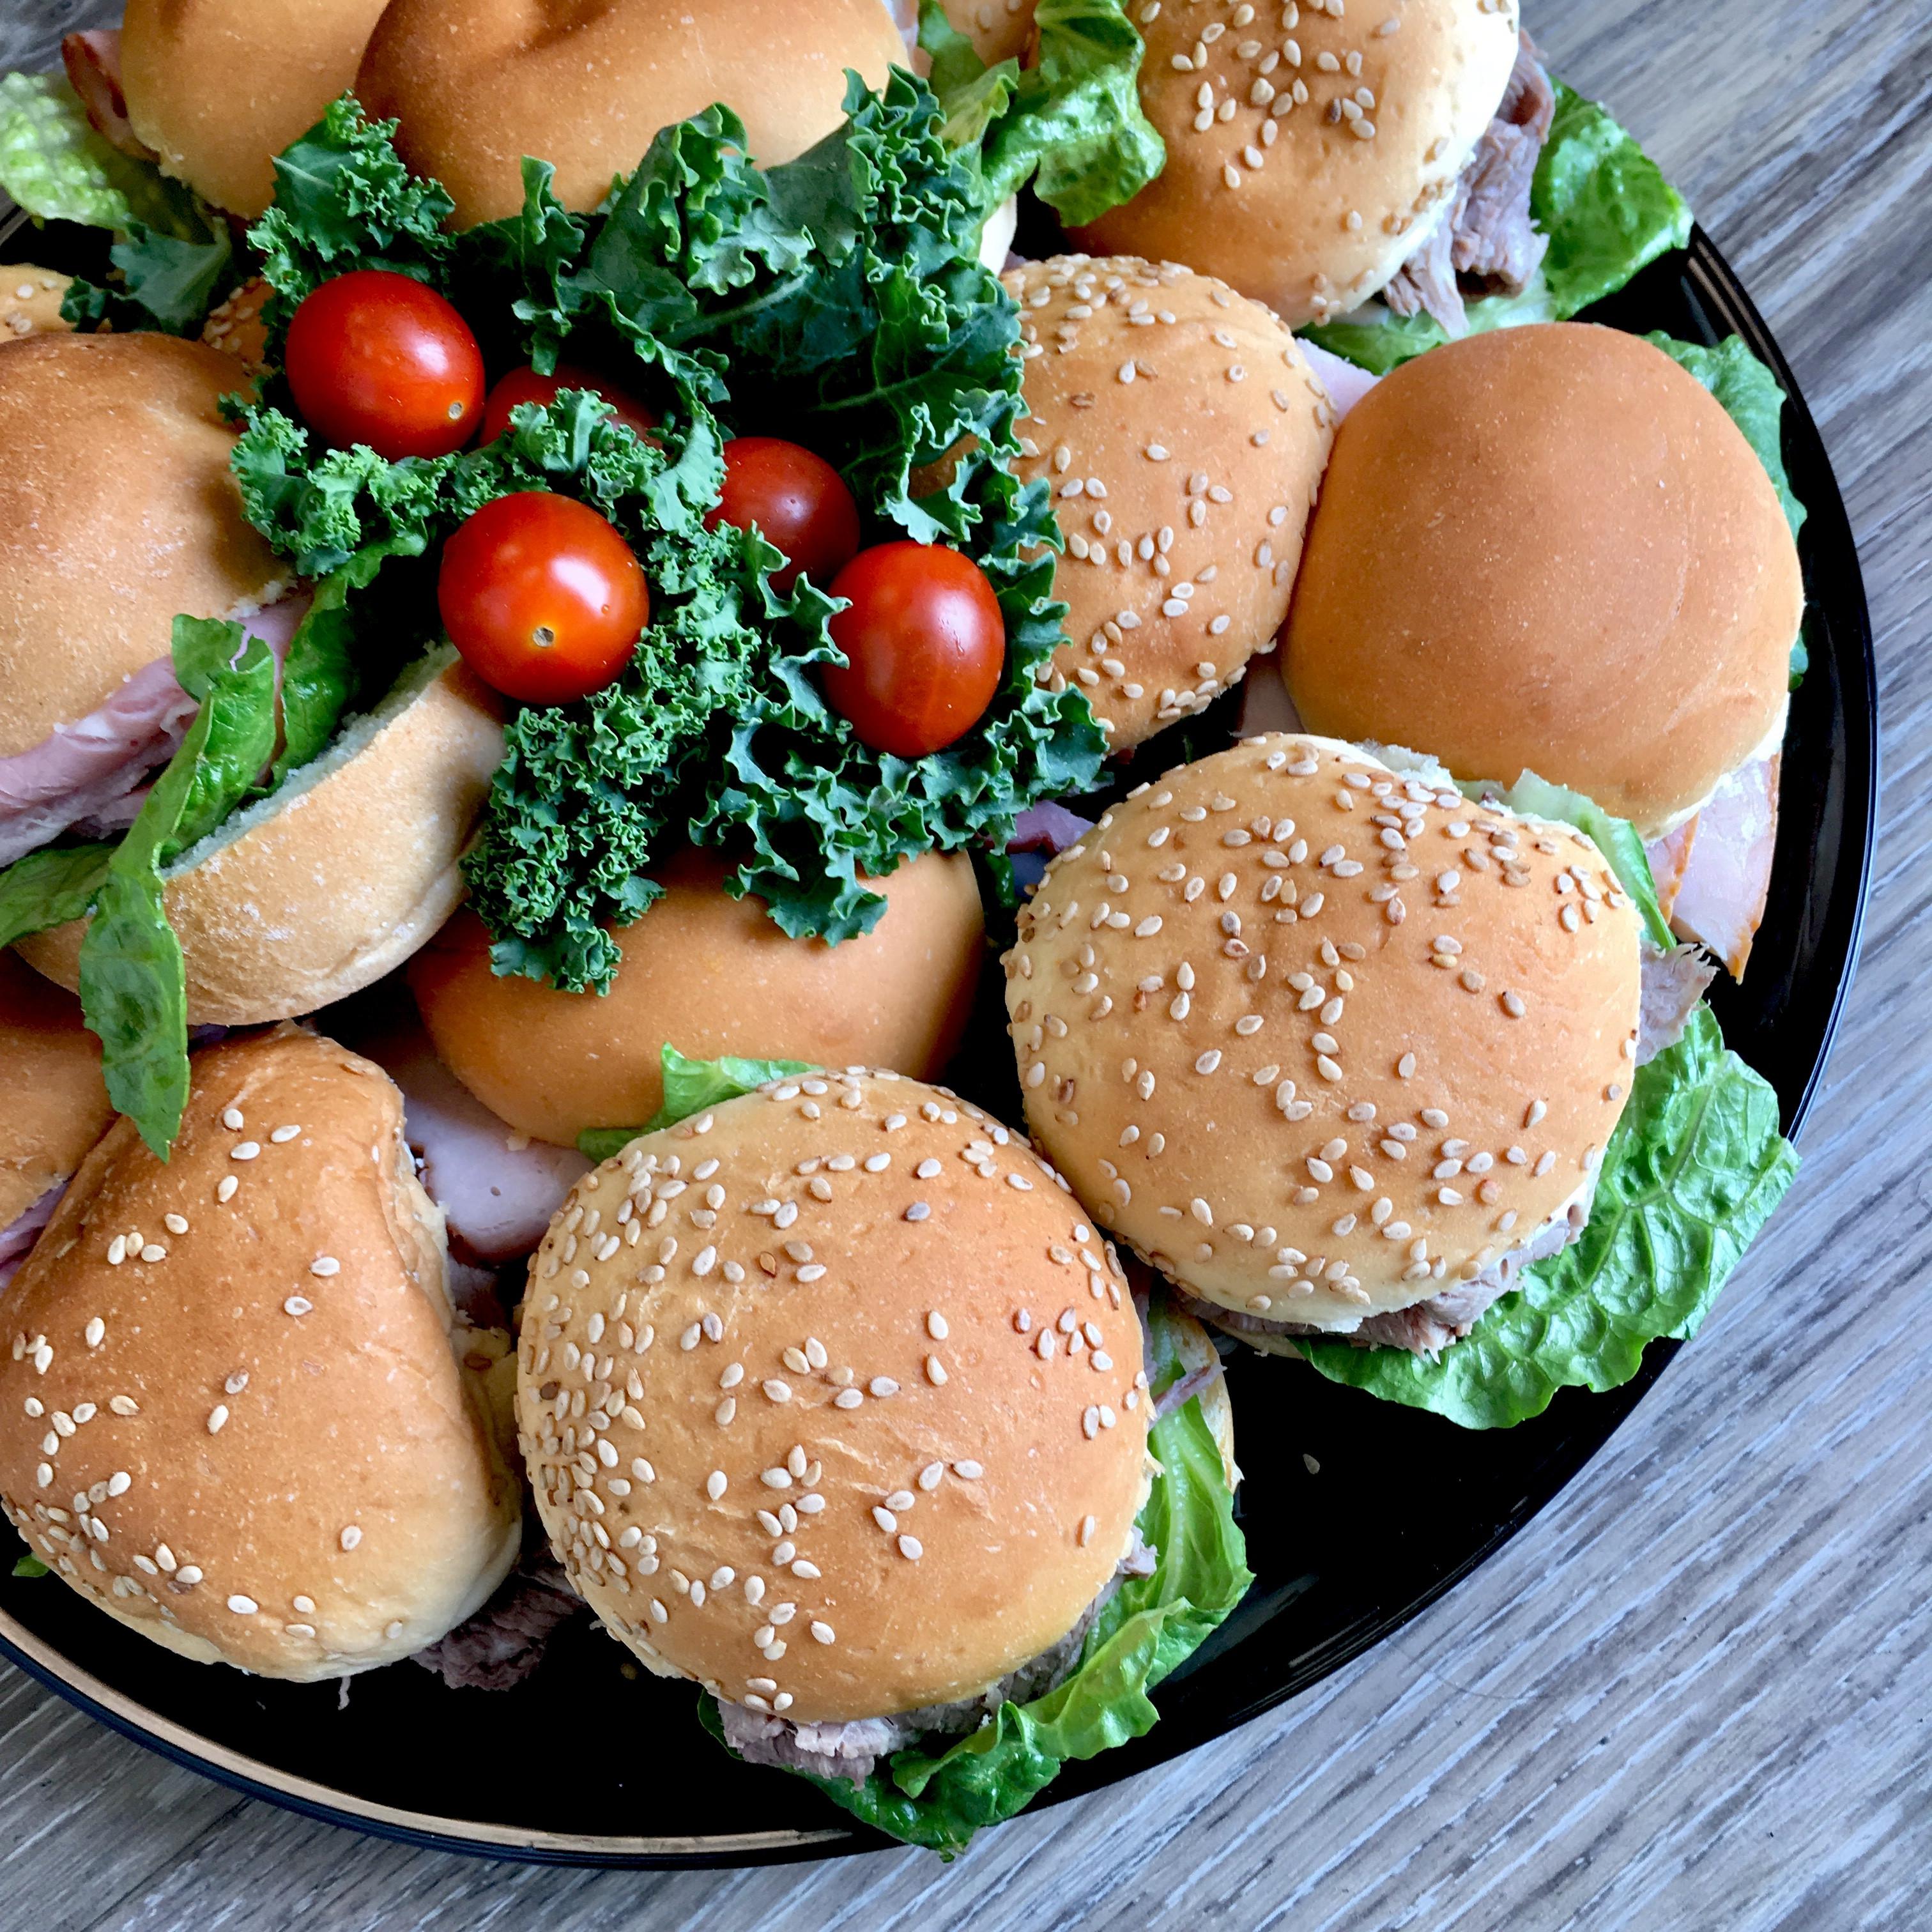 Heb Thanksgiving Dinner 2019  Dollar Sandwich Tray The Art of Entertaining The Art of